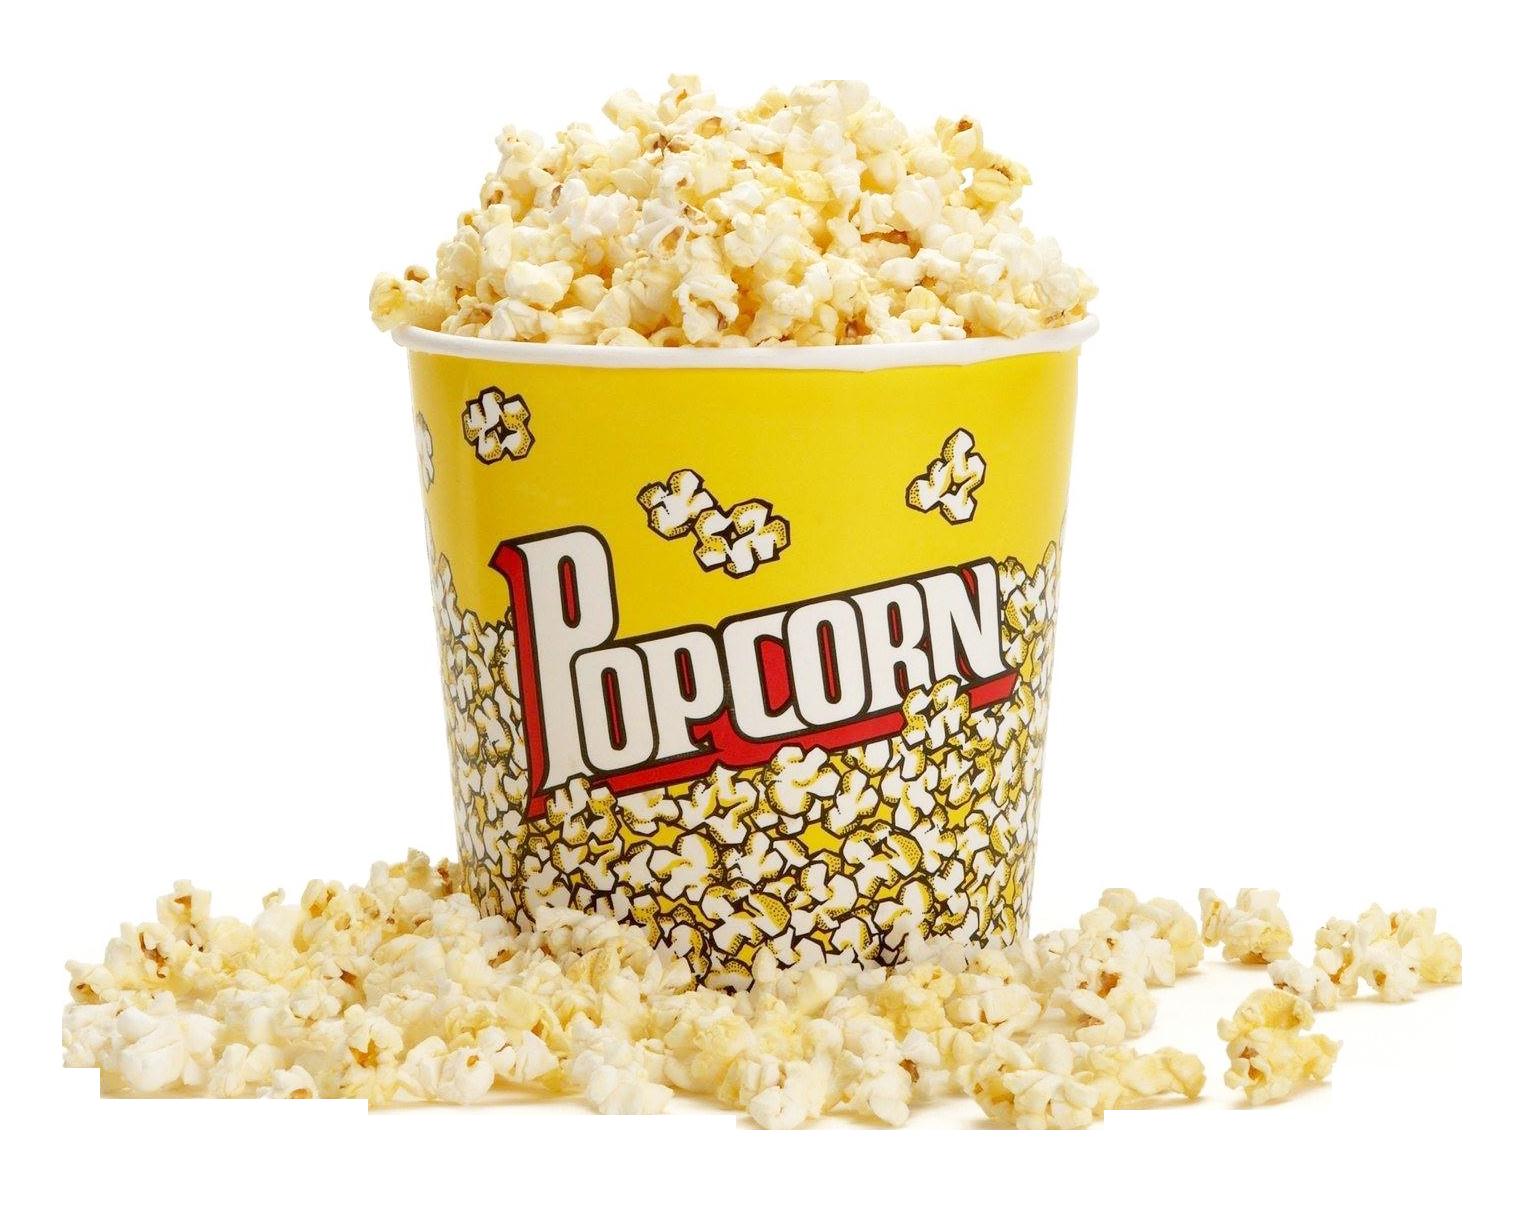 Png image purepng free. Cinema clipart popcorn